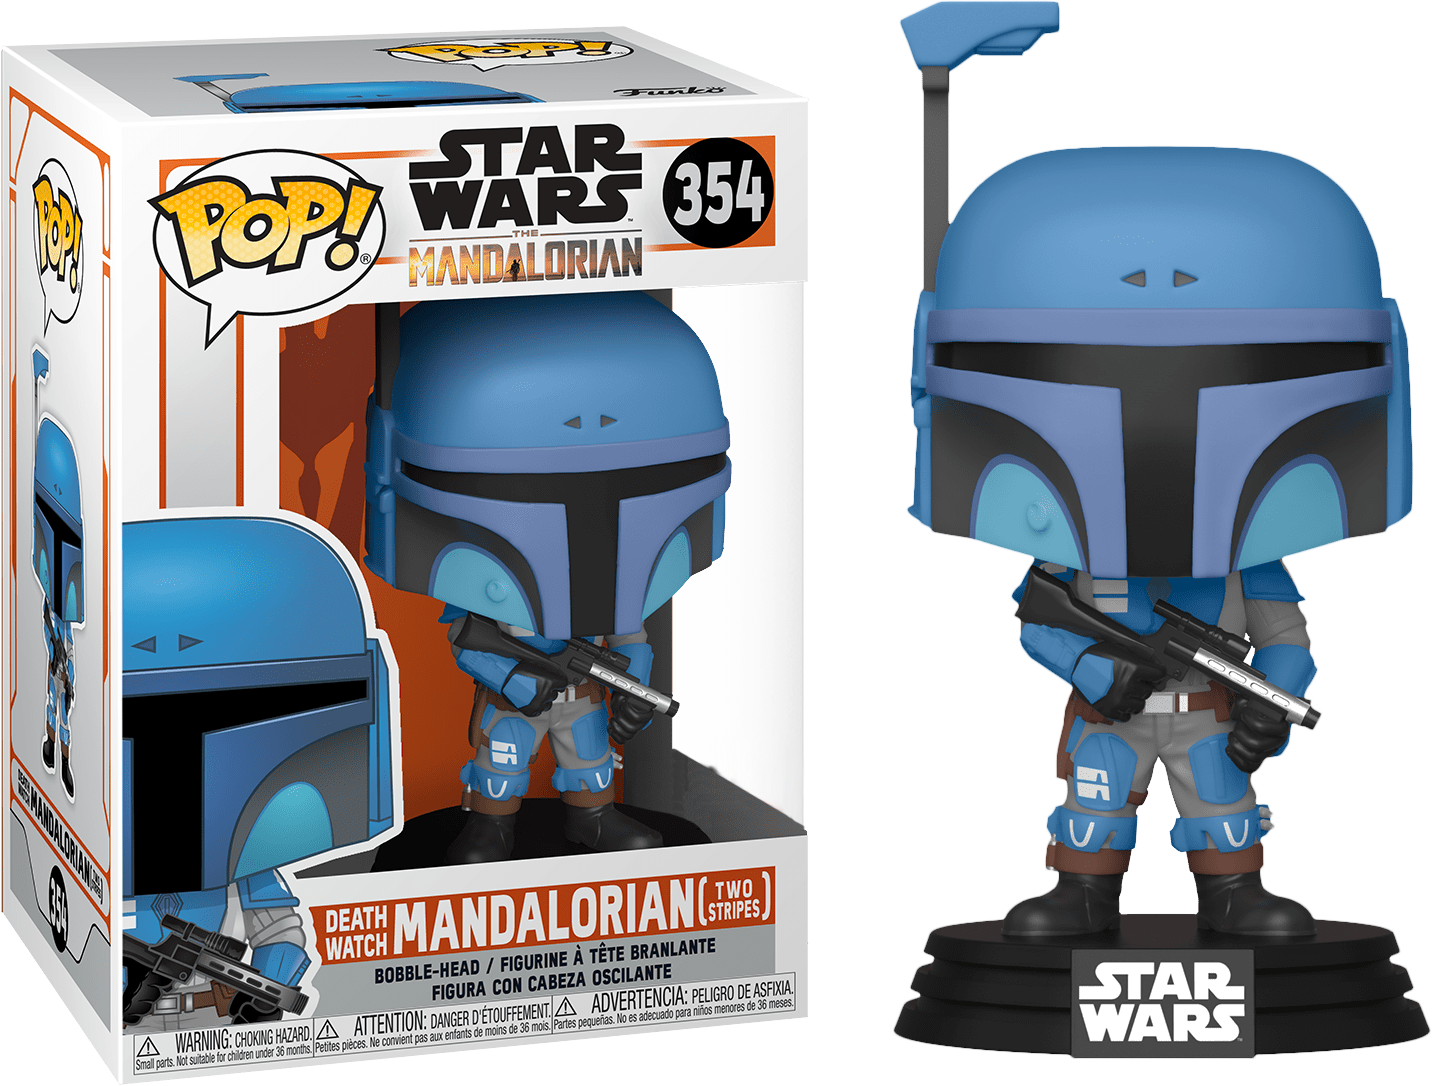 Star Wars The Mandalorian POP! TV Vinyl Figure Death Watch Mandalorian Two Stripes Limited 9 cm